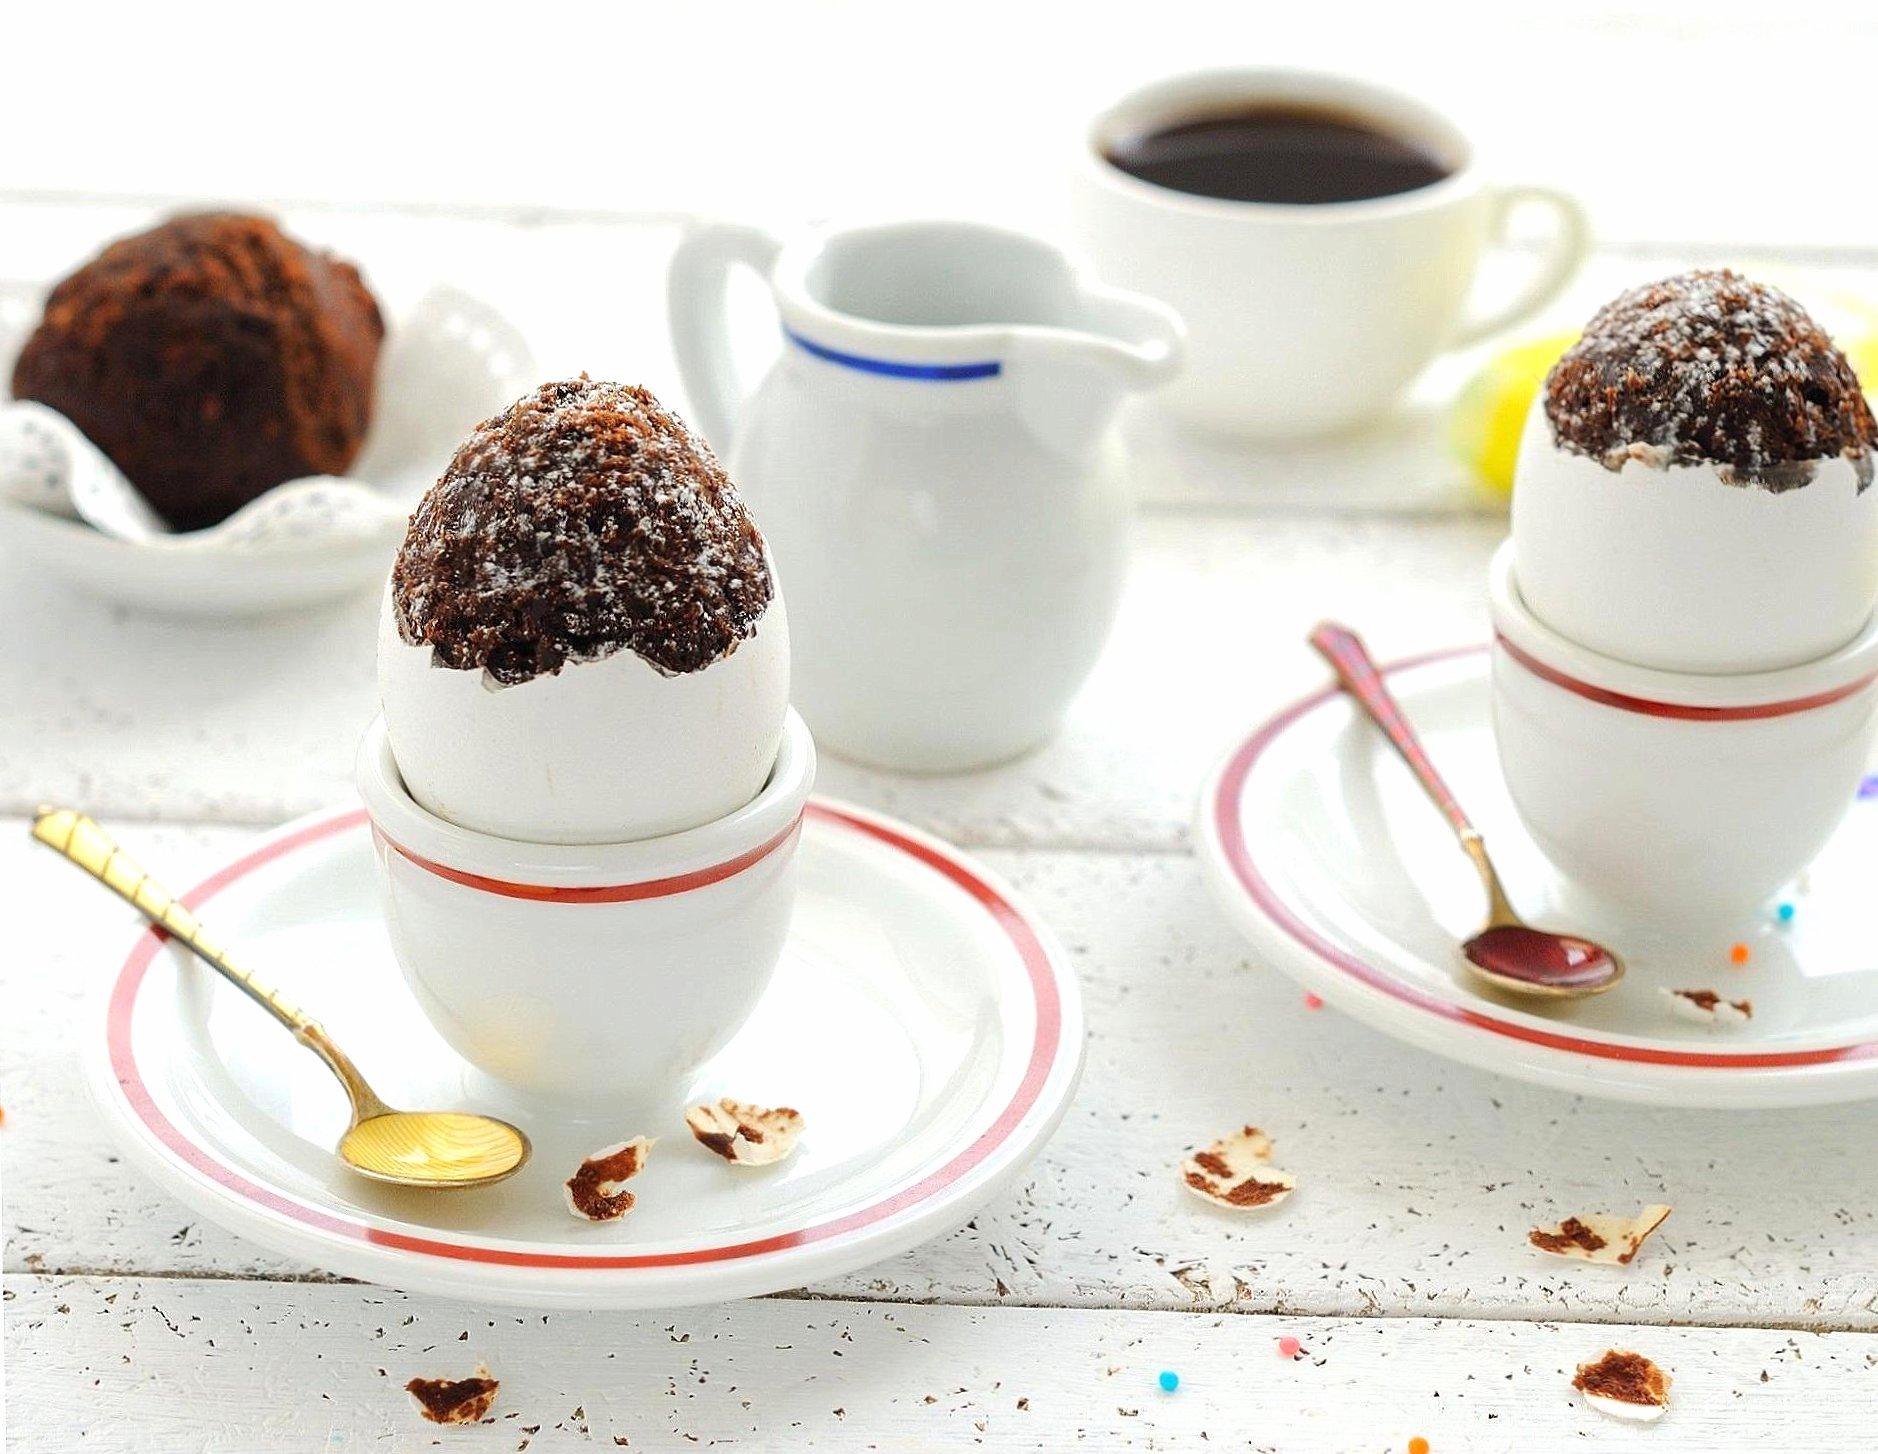 A dessert egg shape wallpapers HD quality